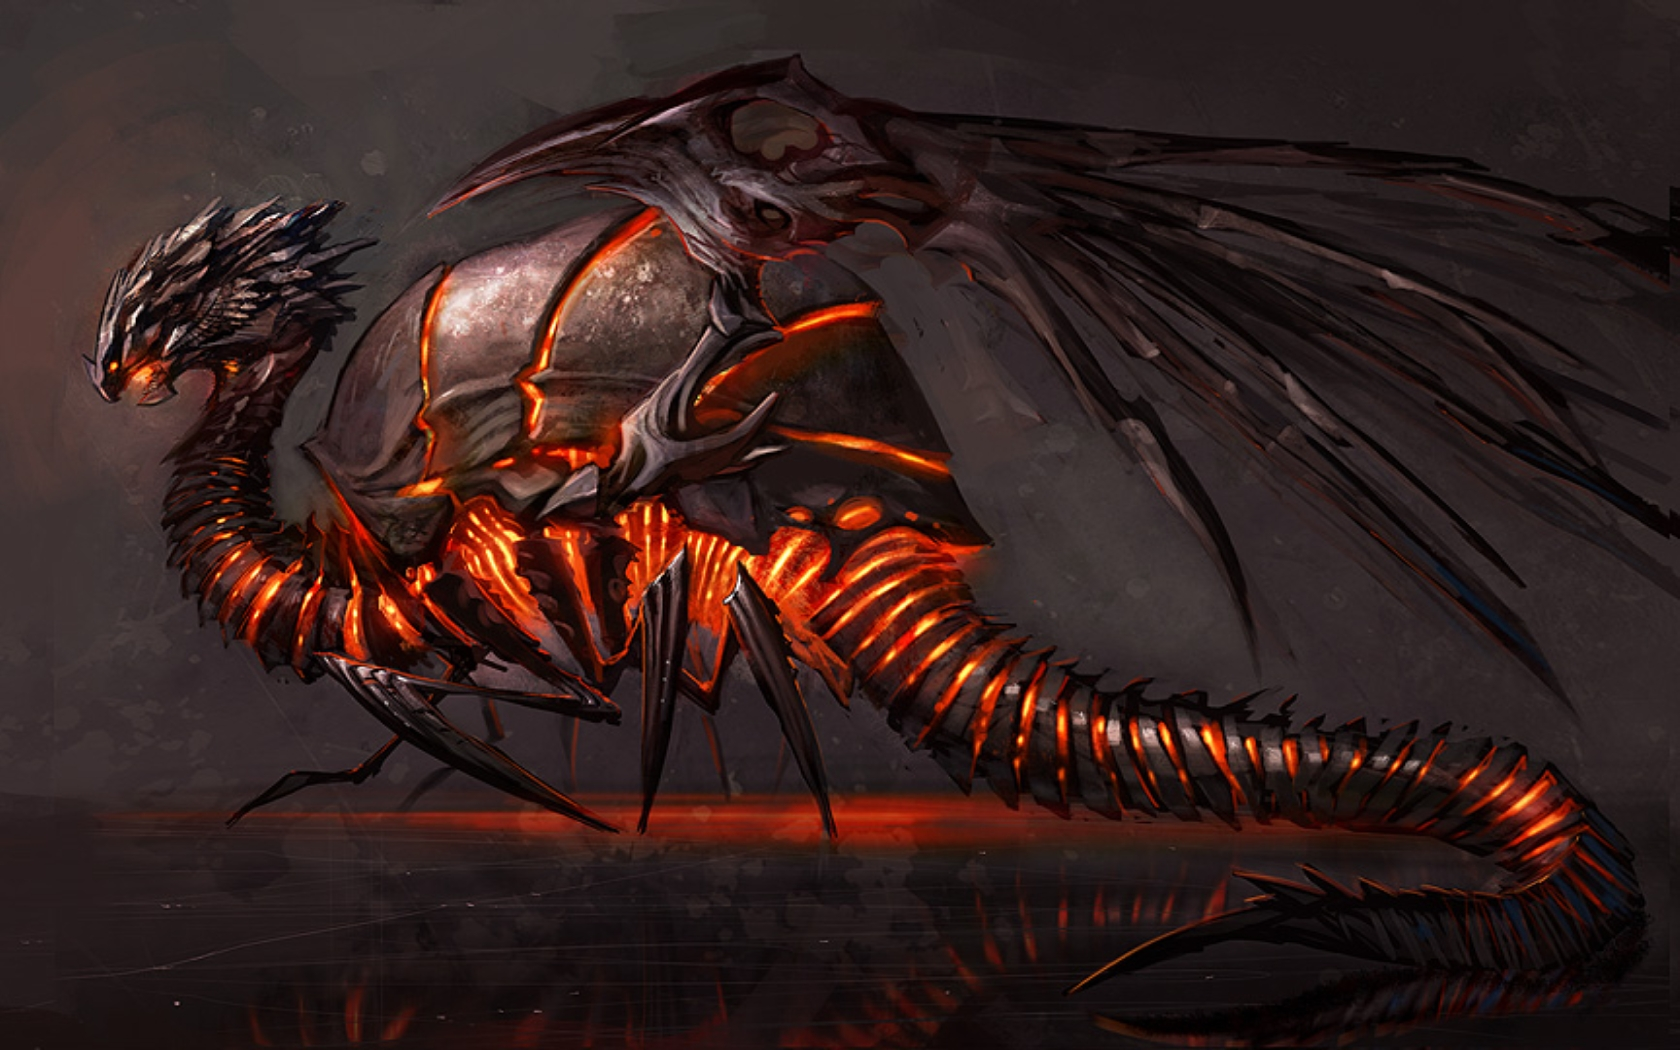 Dragon Fantasy wallpaper | 1680x1050 | #42300